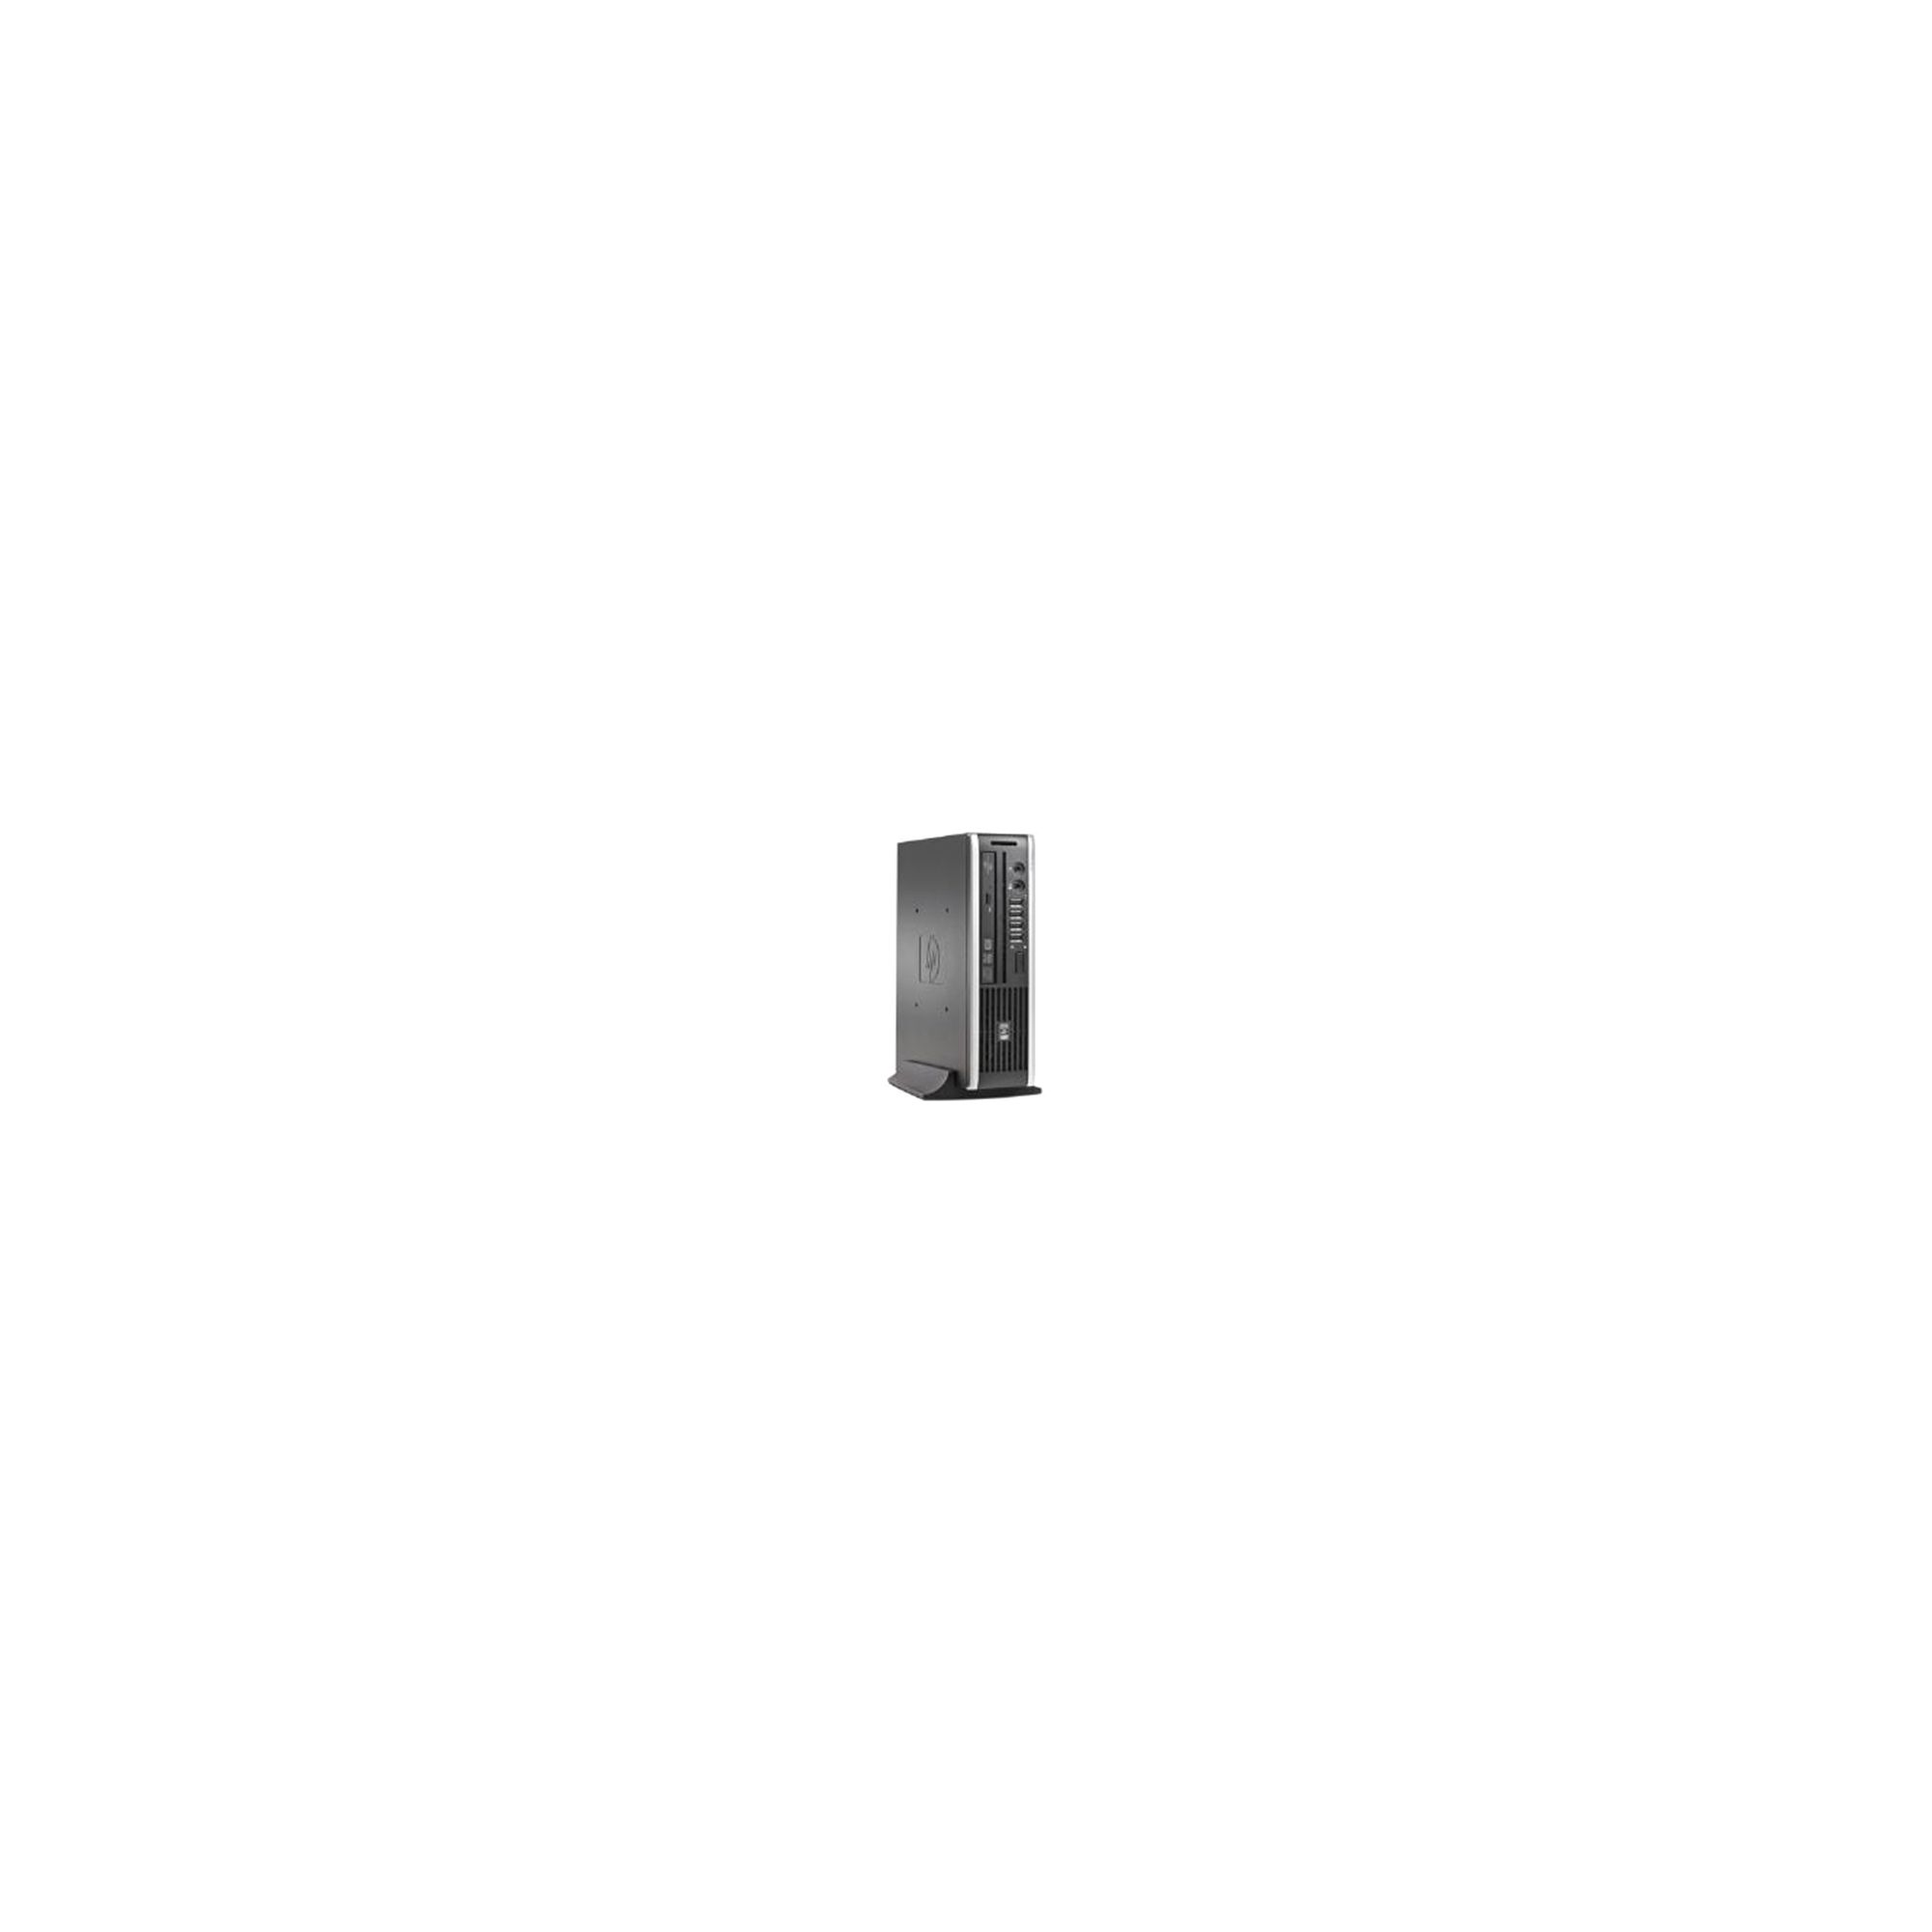 Compaq 8300 Elite Ultra-Slim Desktop PC Core i5 (3470S) 2.9GHz 2GB 320GB DVD Writer SM LAN Windows 7 Pro 32-bit (Intel HD Graphics 2500) Energy Star